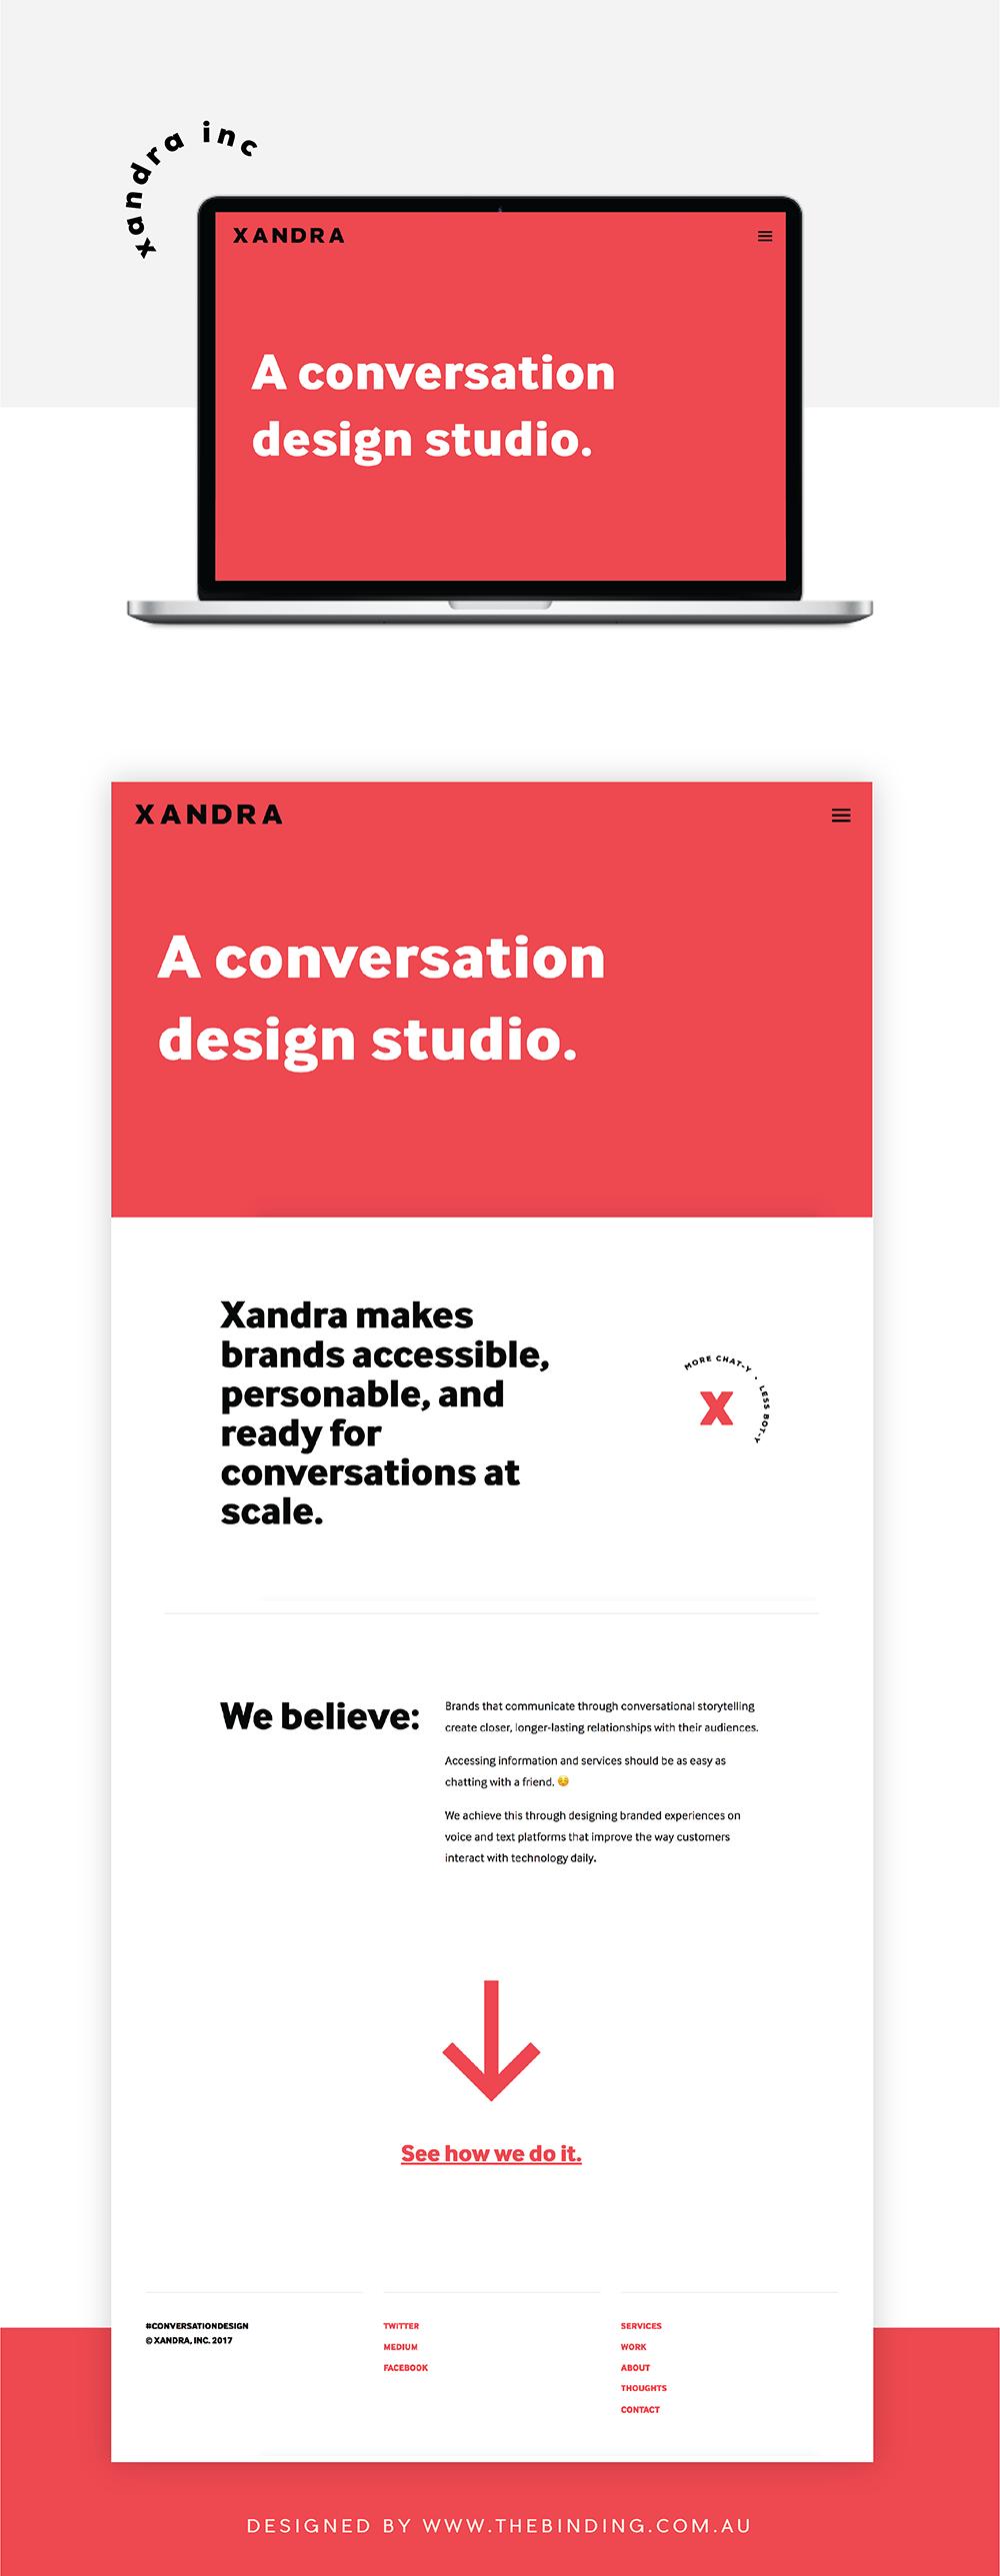 Xandra Inc-03.png